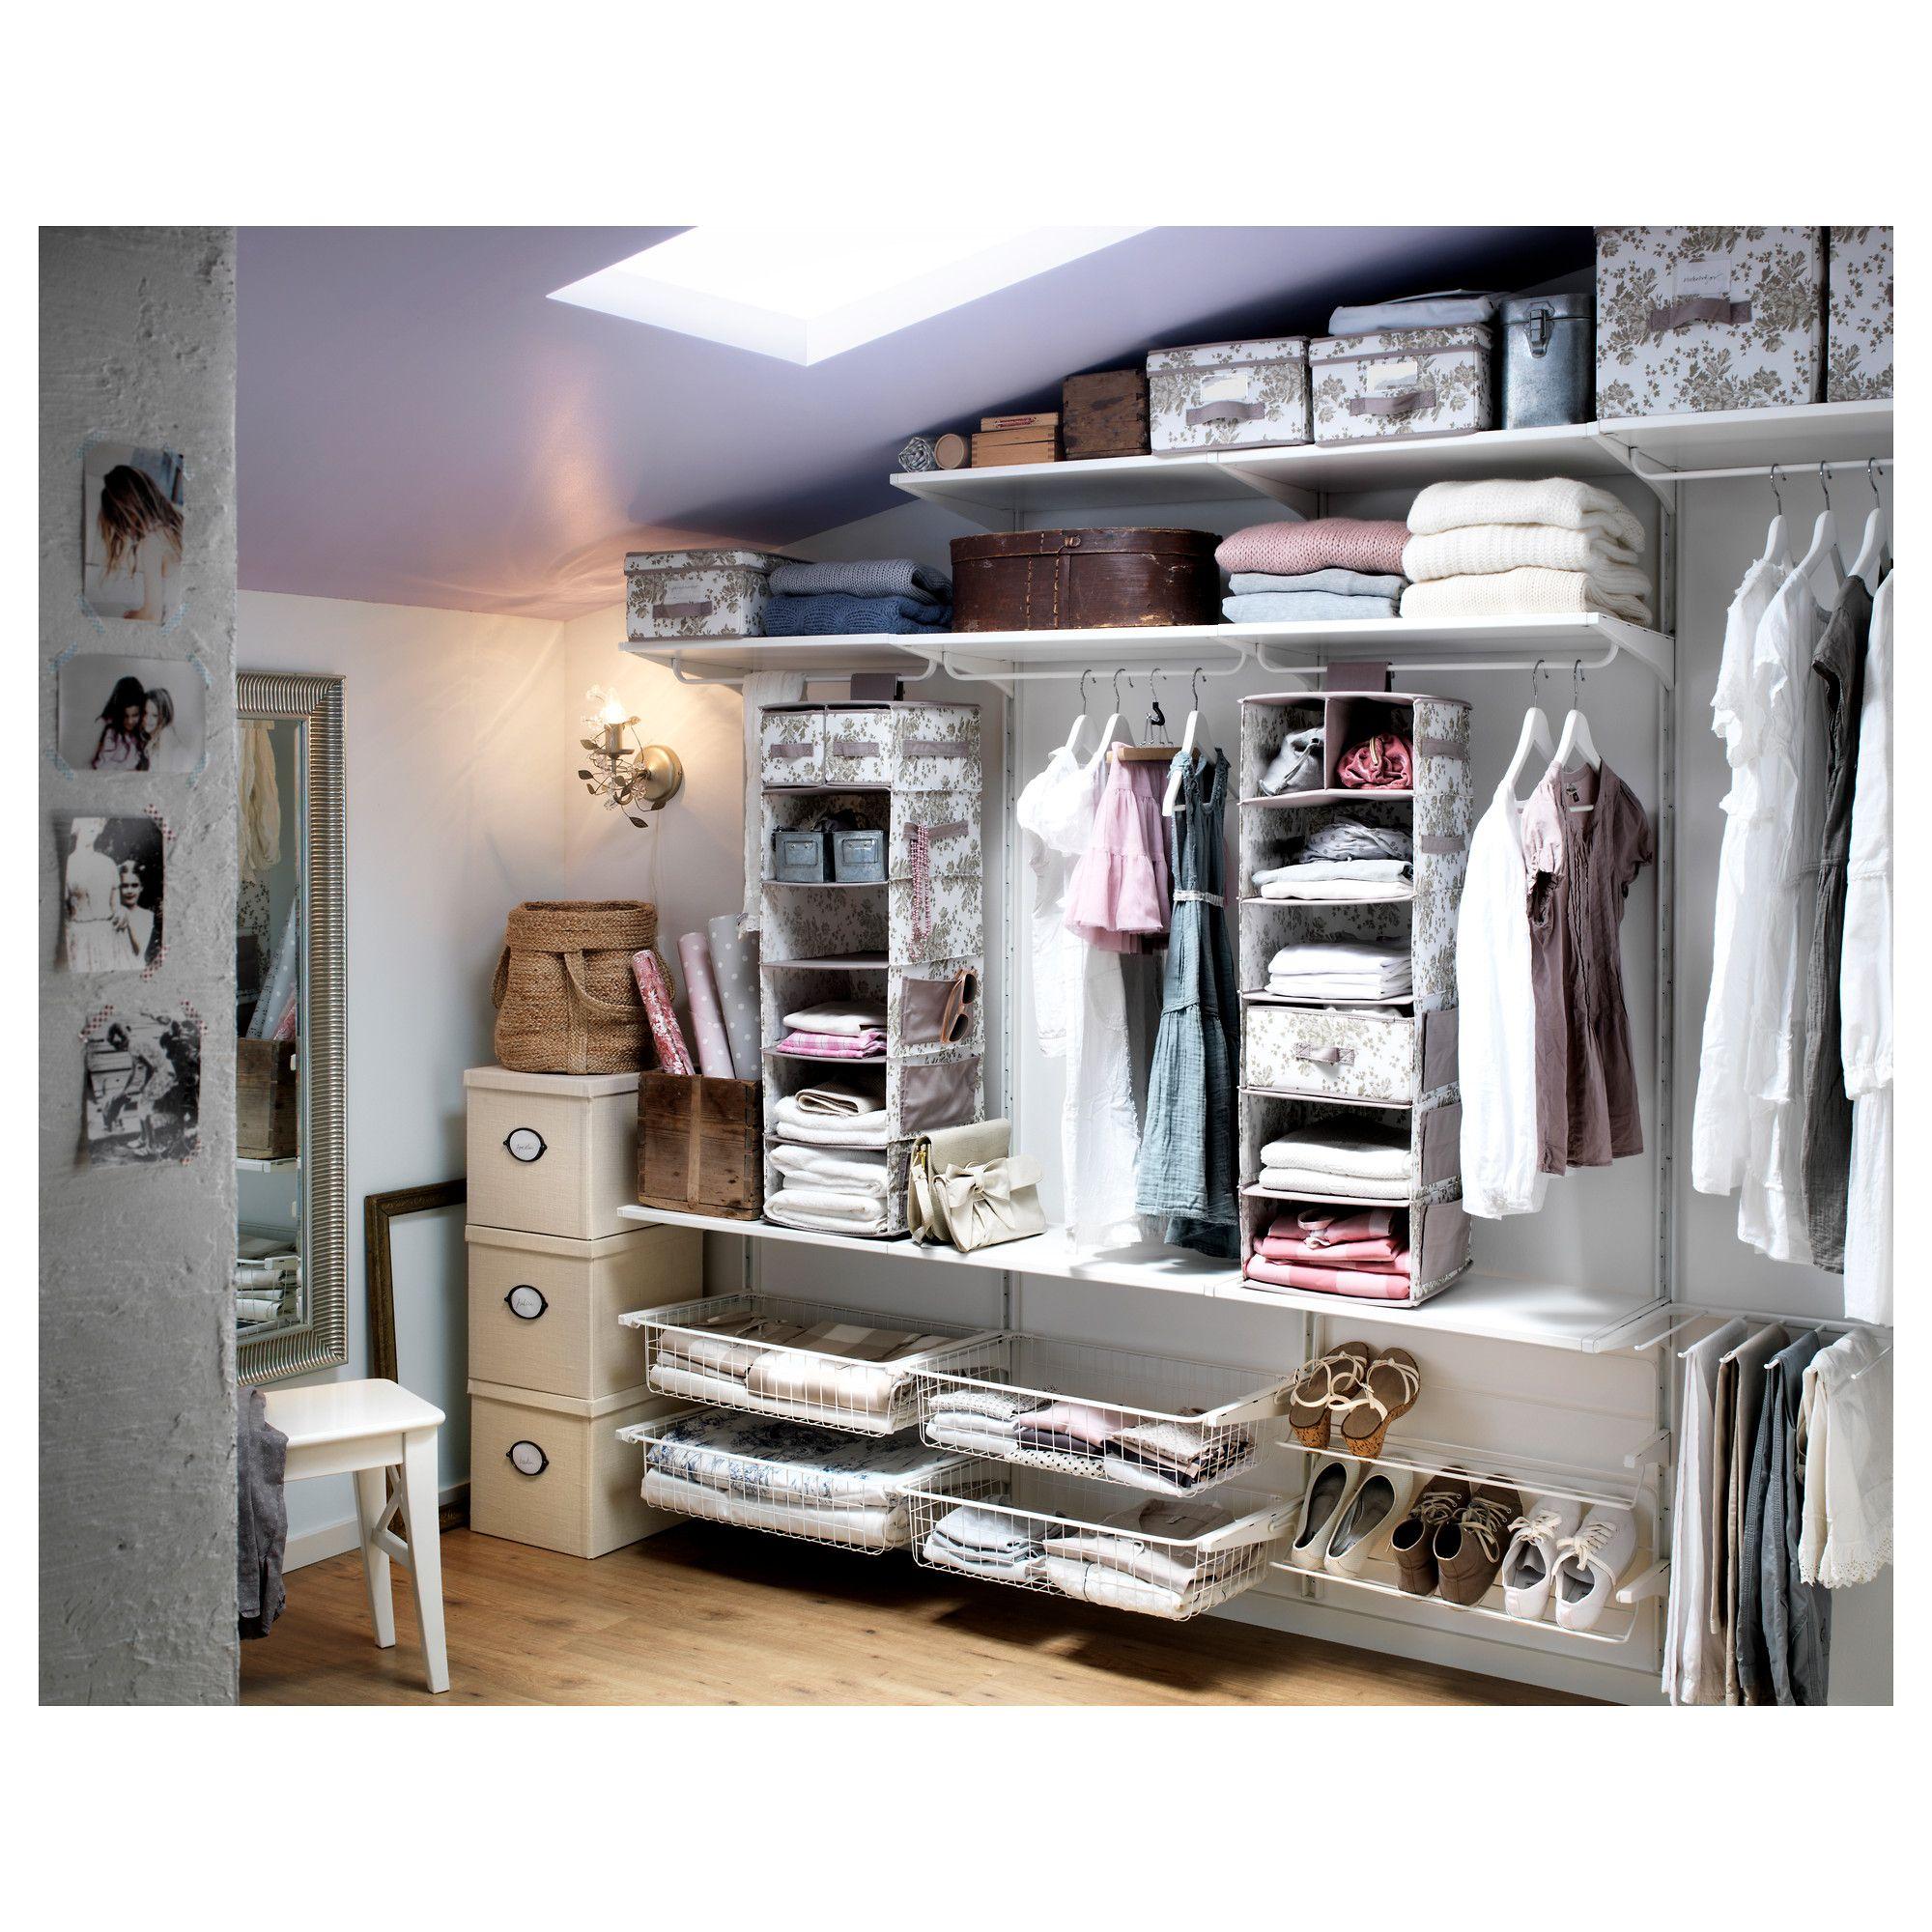 Cabina Armadio Ikea Algot.Algot Ikea Storage System In Closet Ripostiglio A Muro Idee